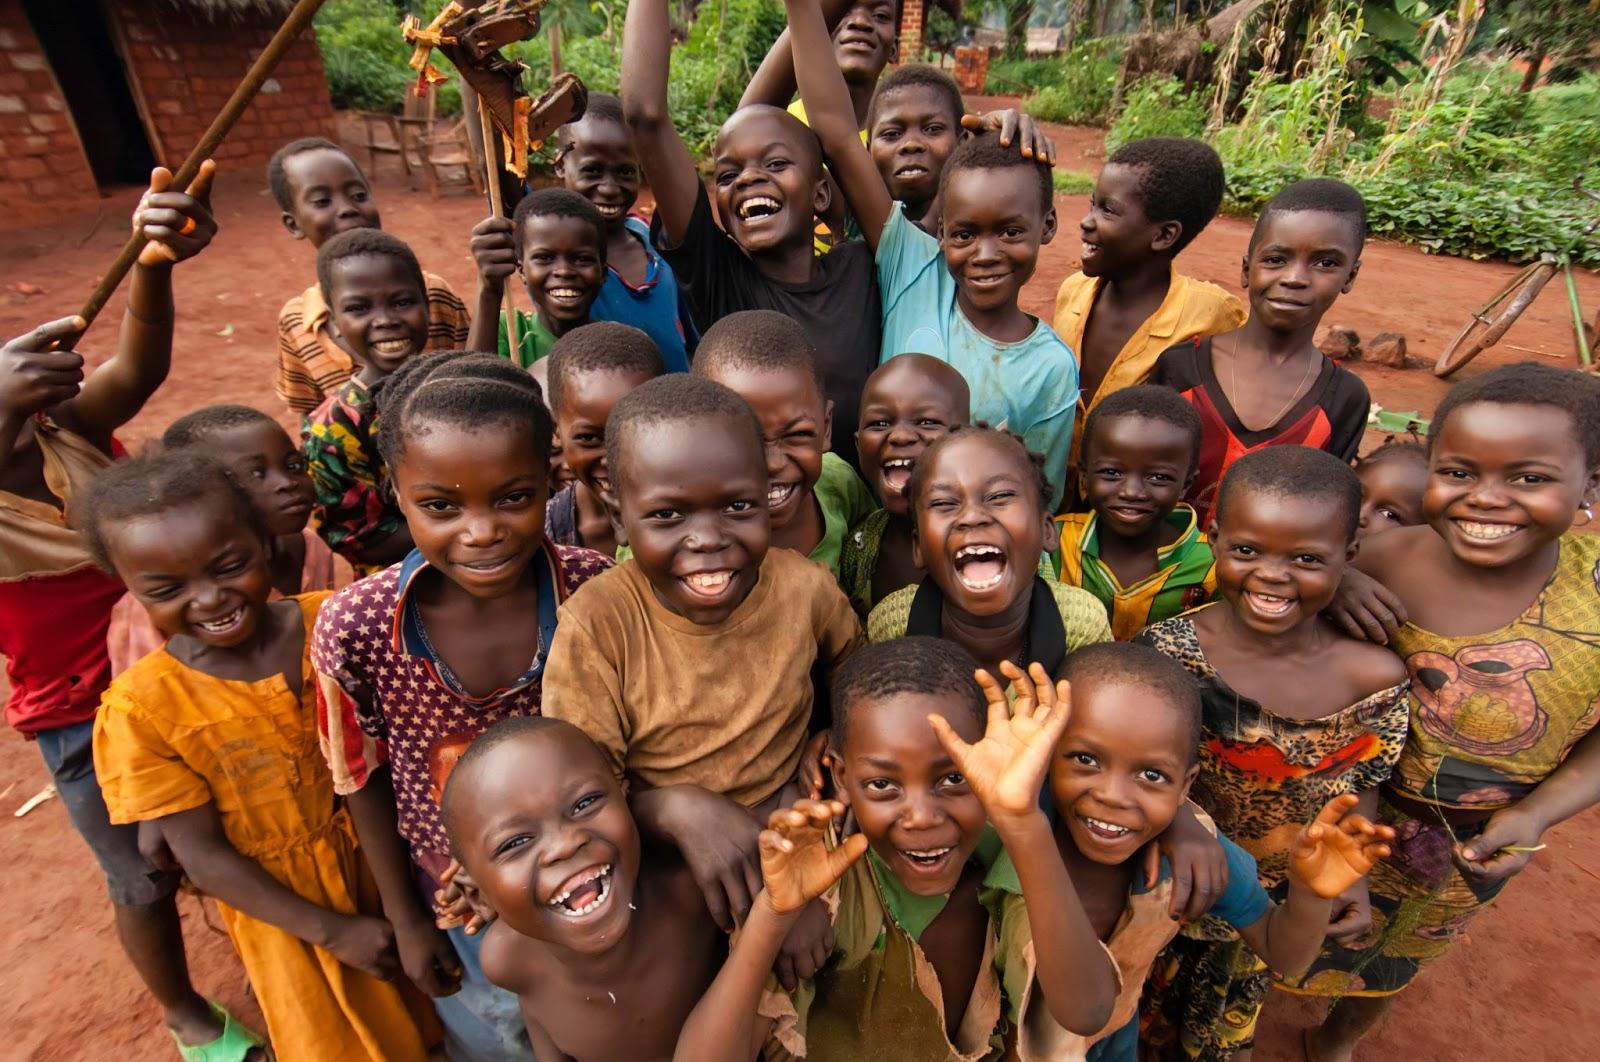 https://i0.wp.com/africa-facts.org/wp-content/uploads/2015/01/african-kids.jpg